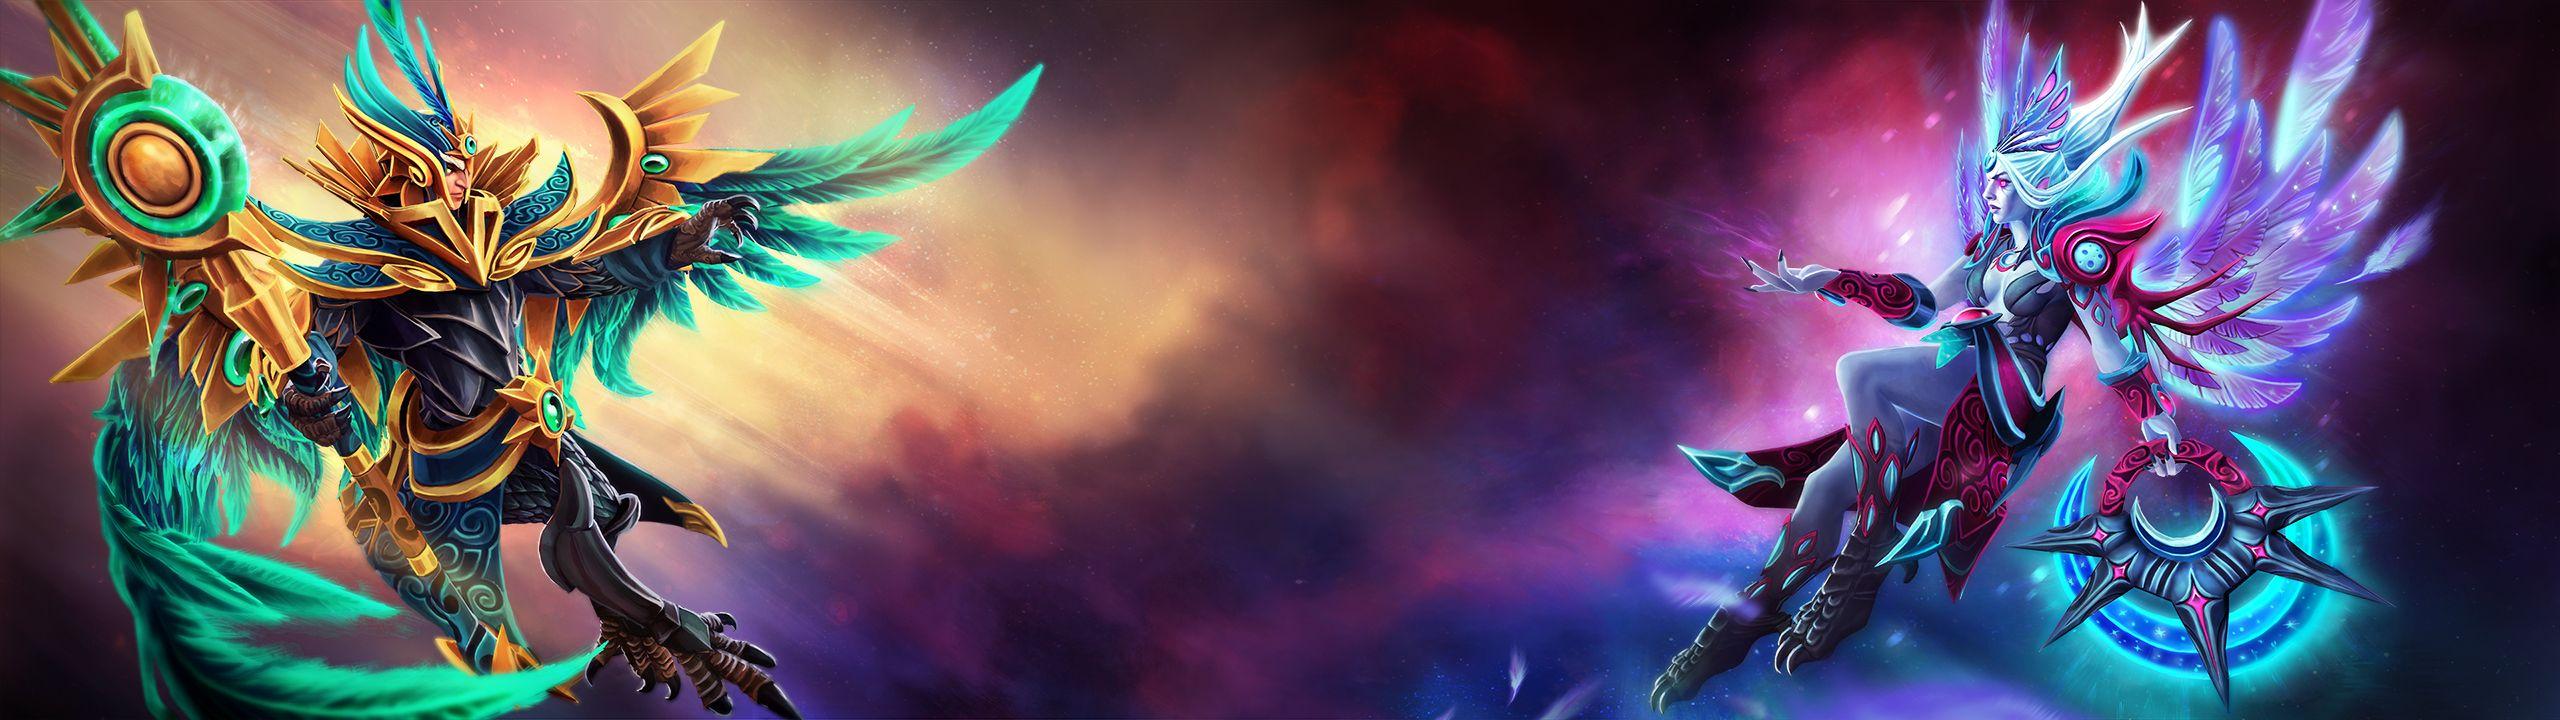 Vengeful Spirit And Skywrath Mage Wallpaper More Dota2walls